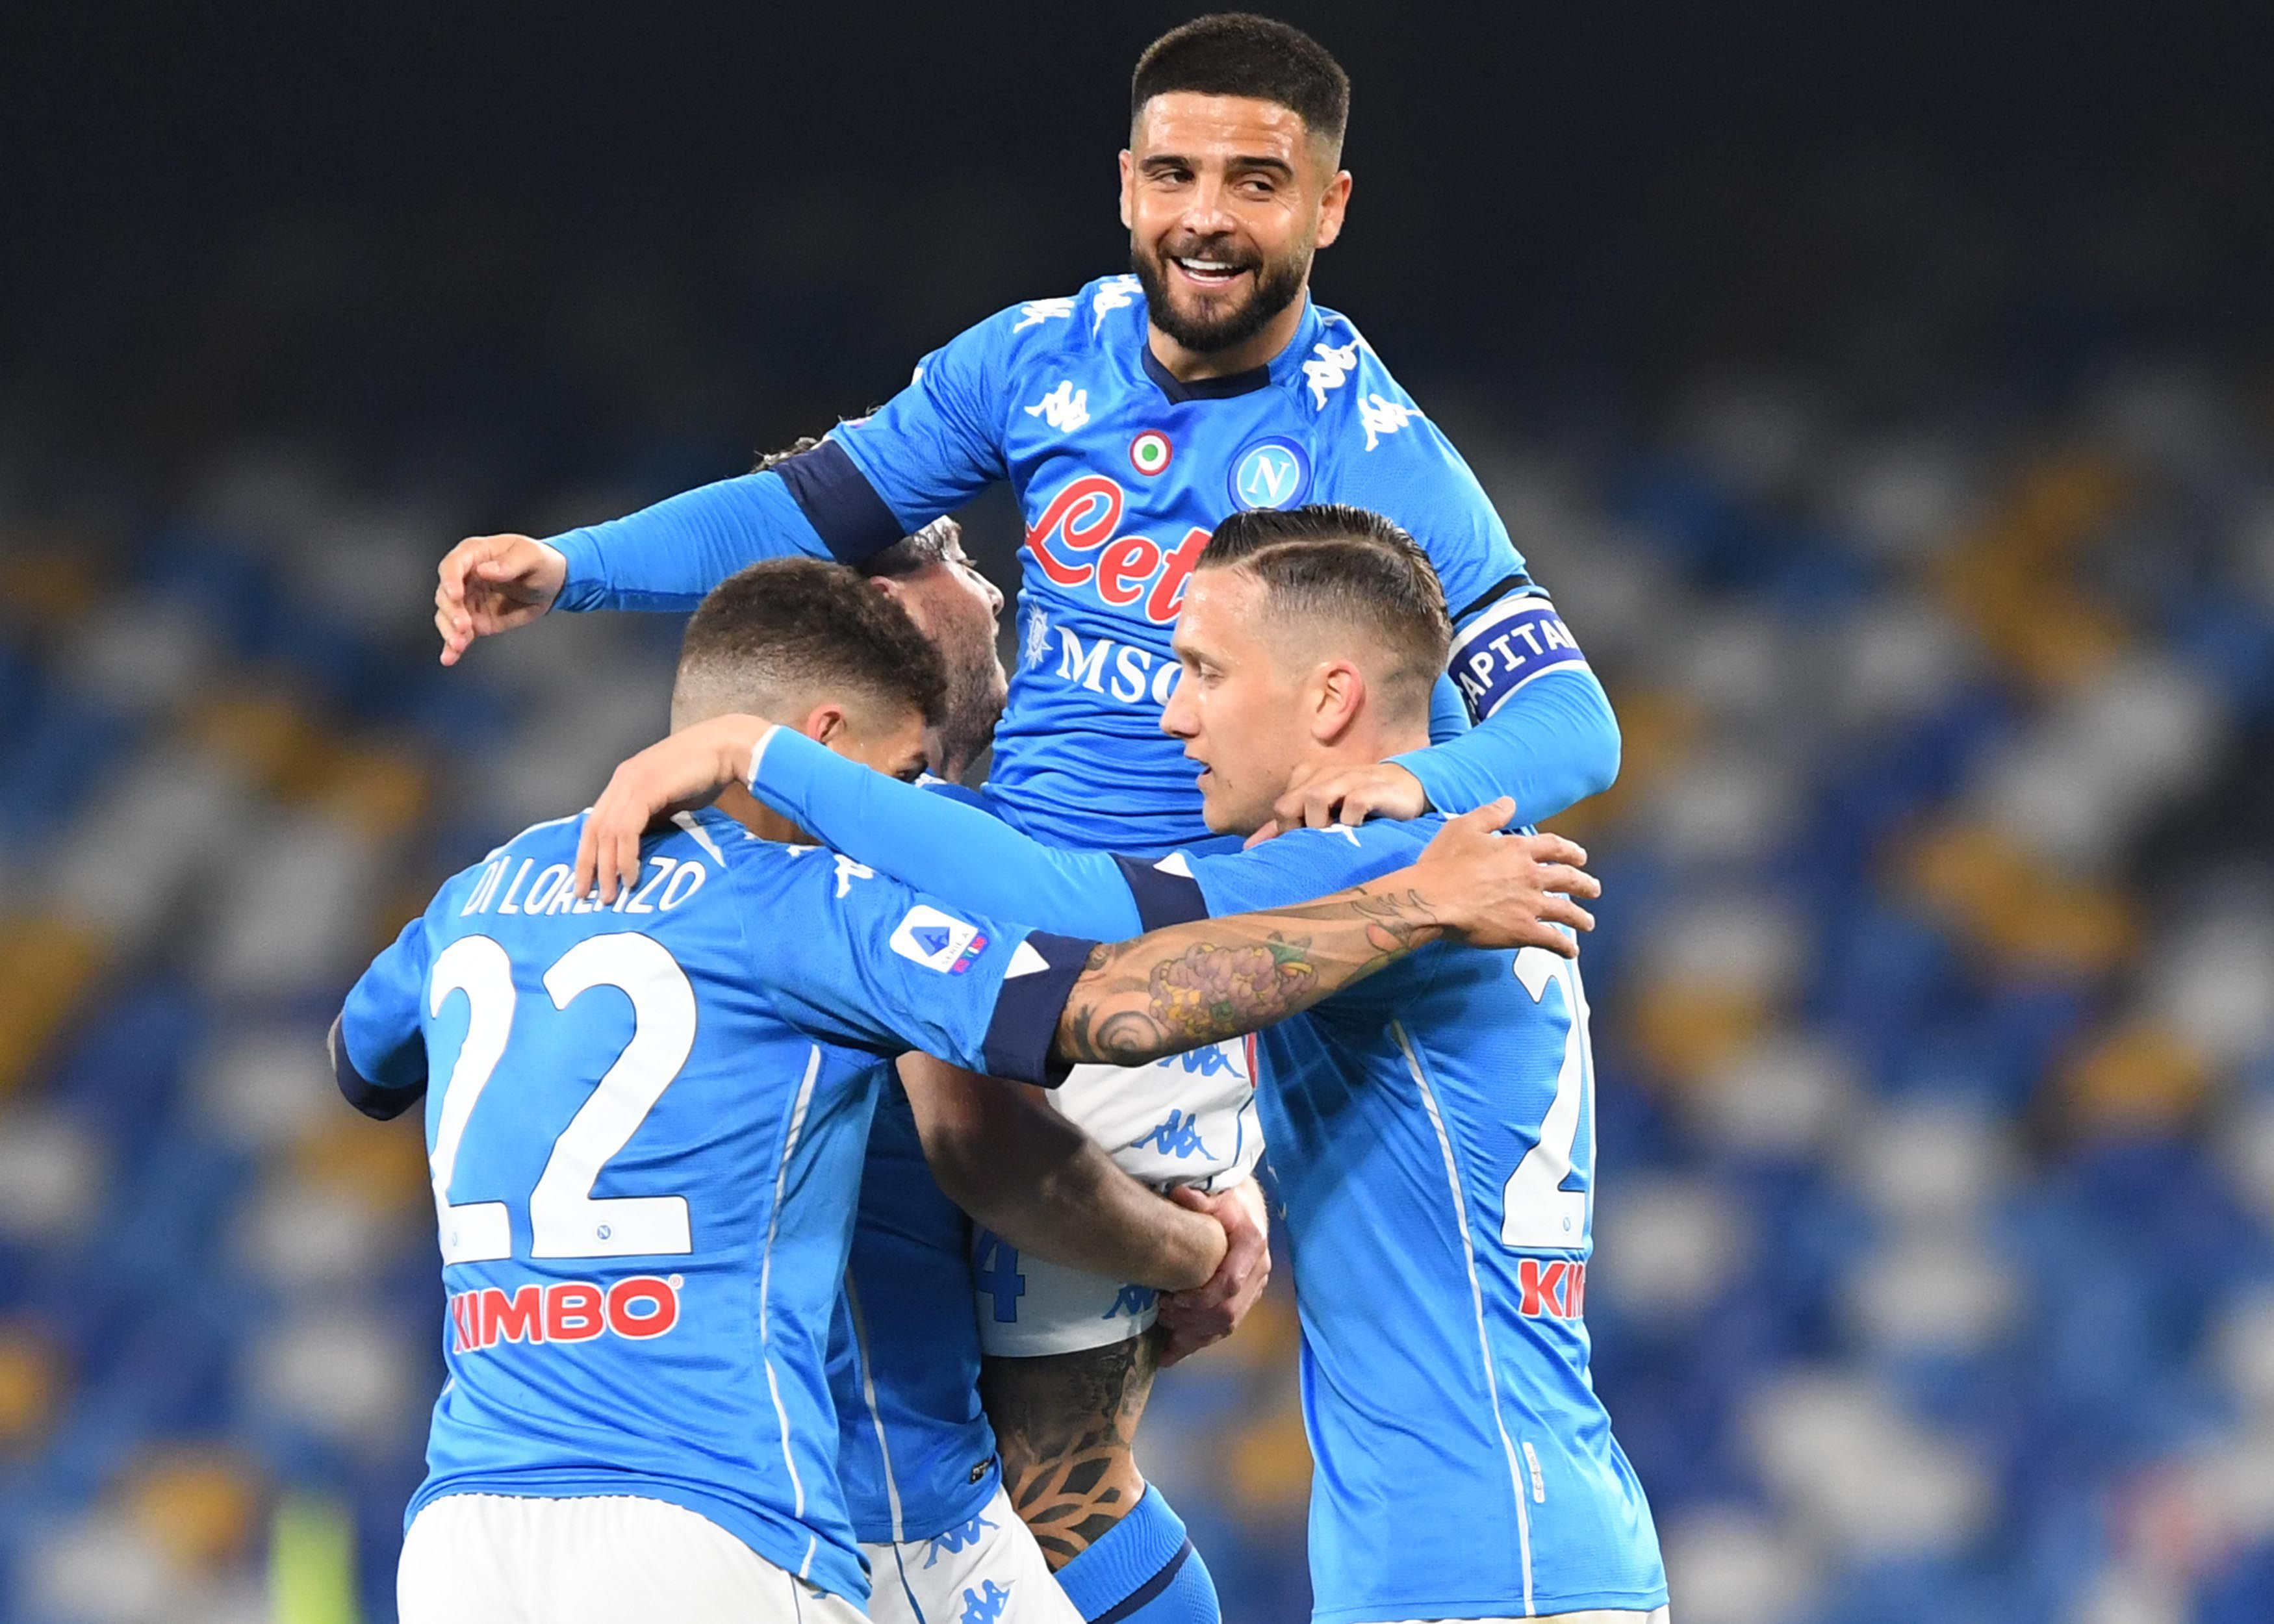 Napoli Bologna